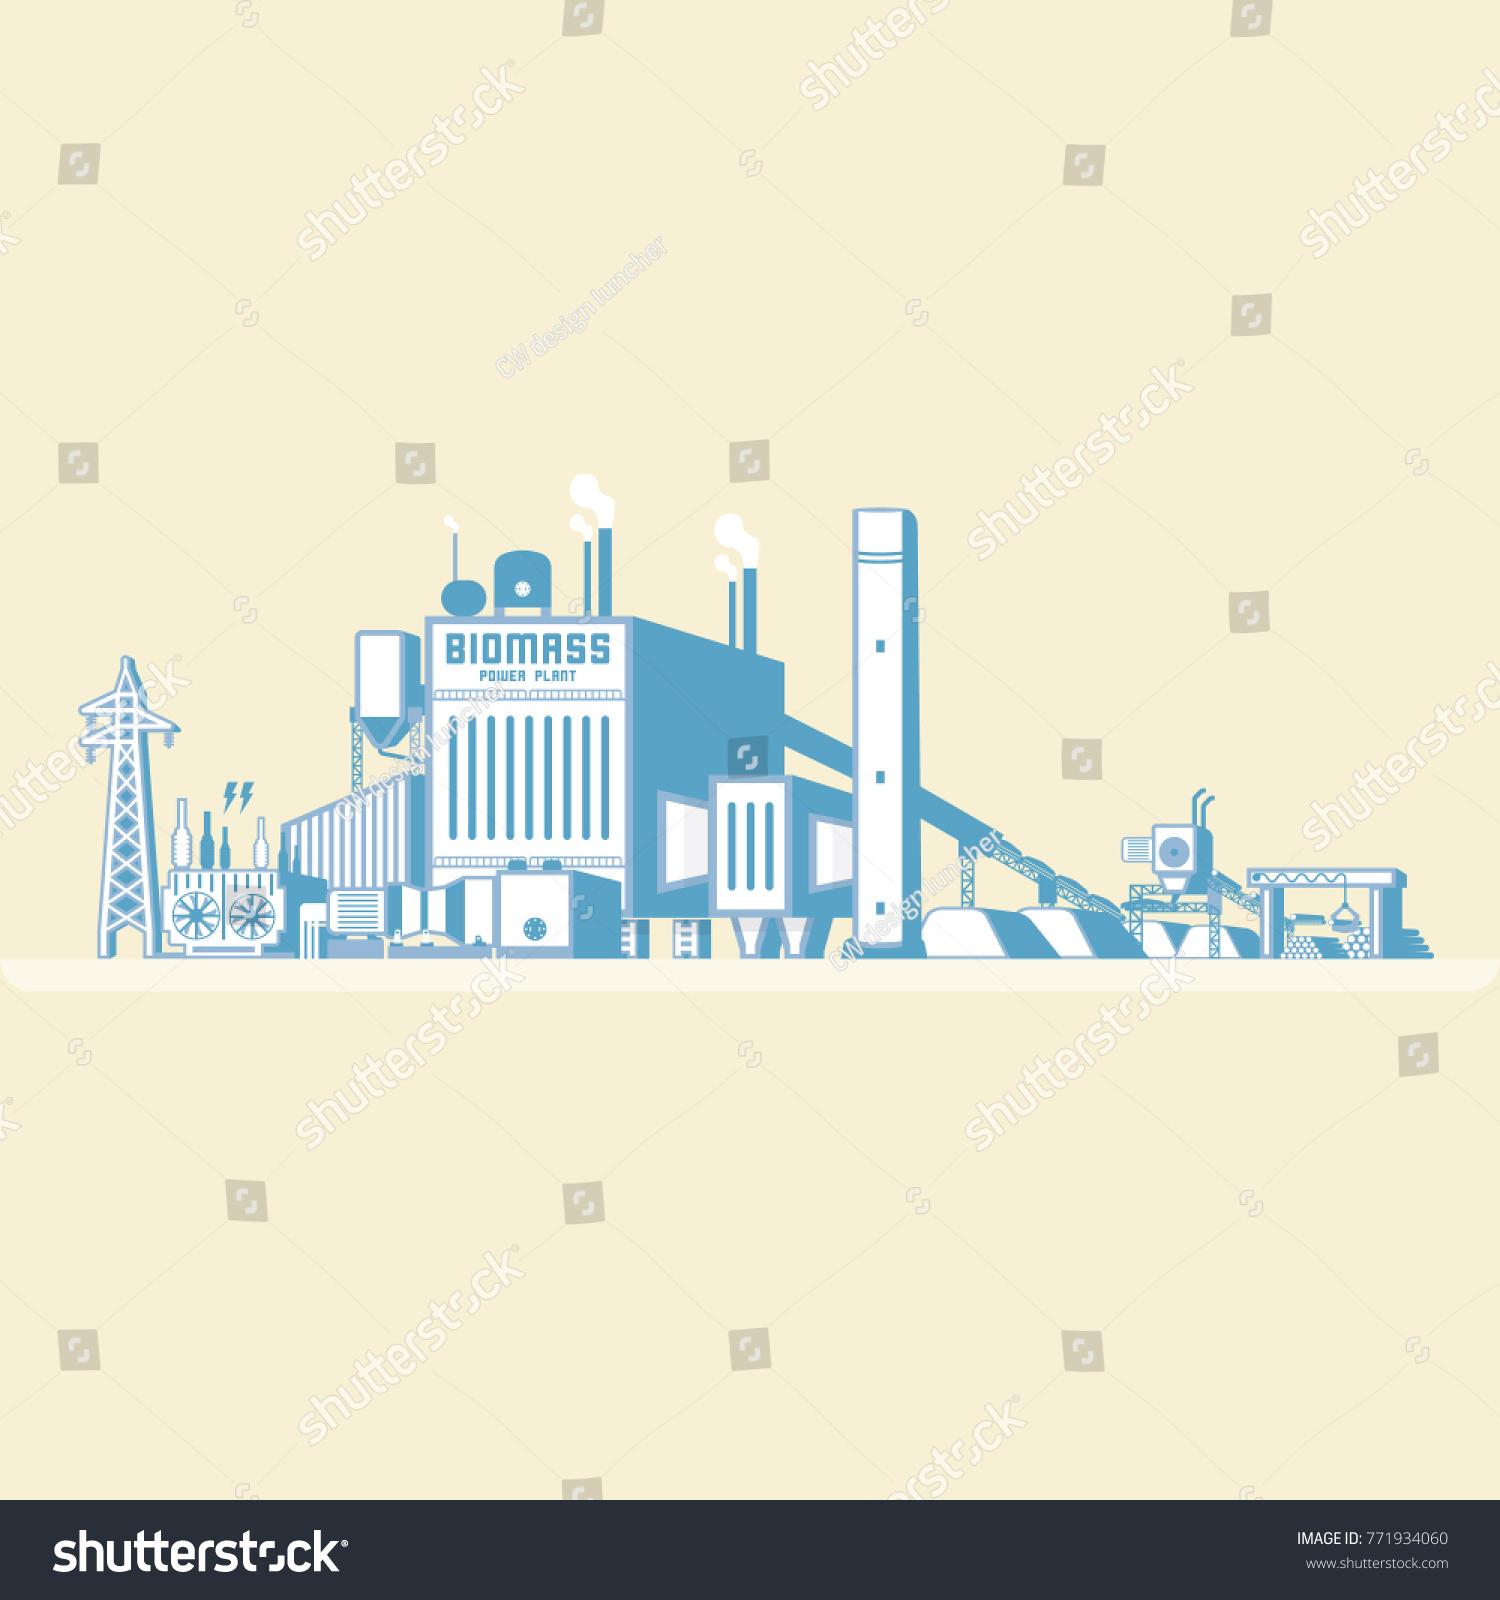 Biomass Energy Biomass Power Plant Boiler Stock Vector (Royalty Free ...